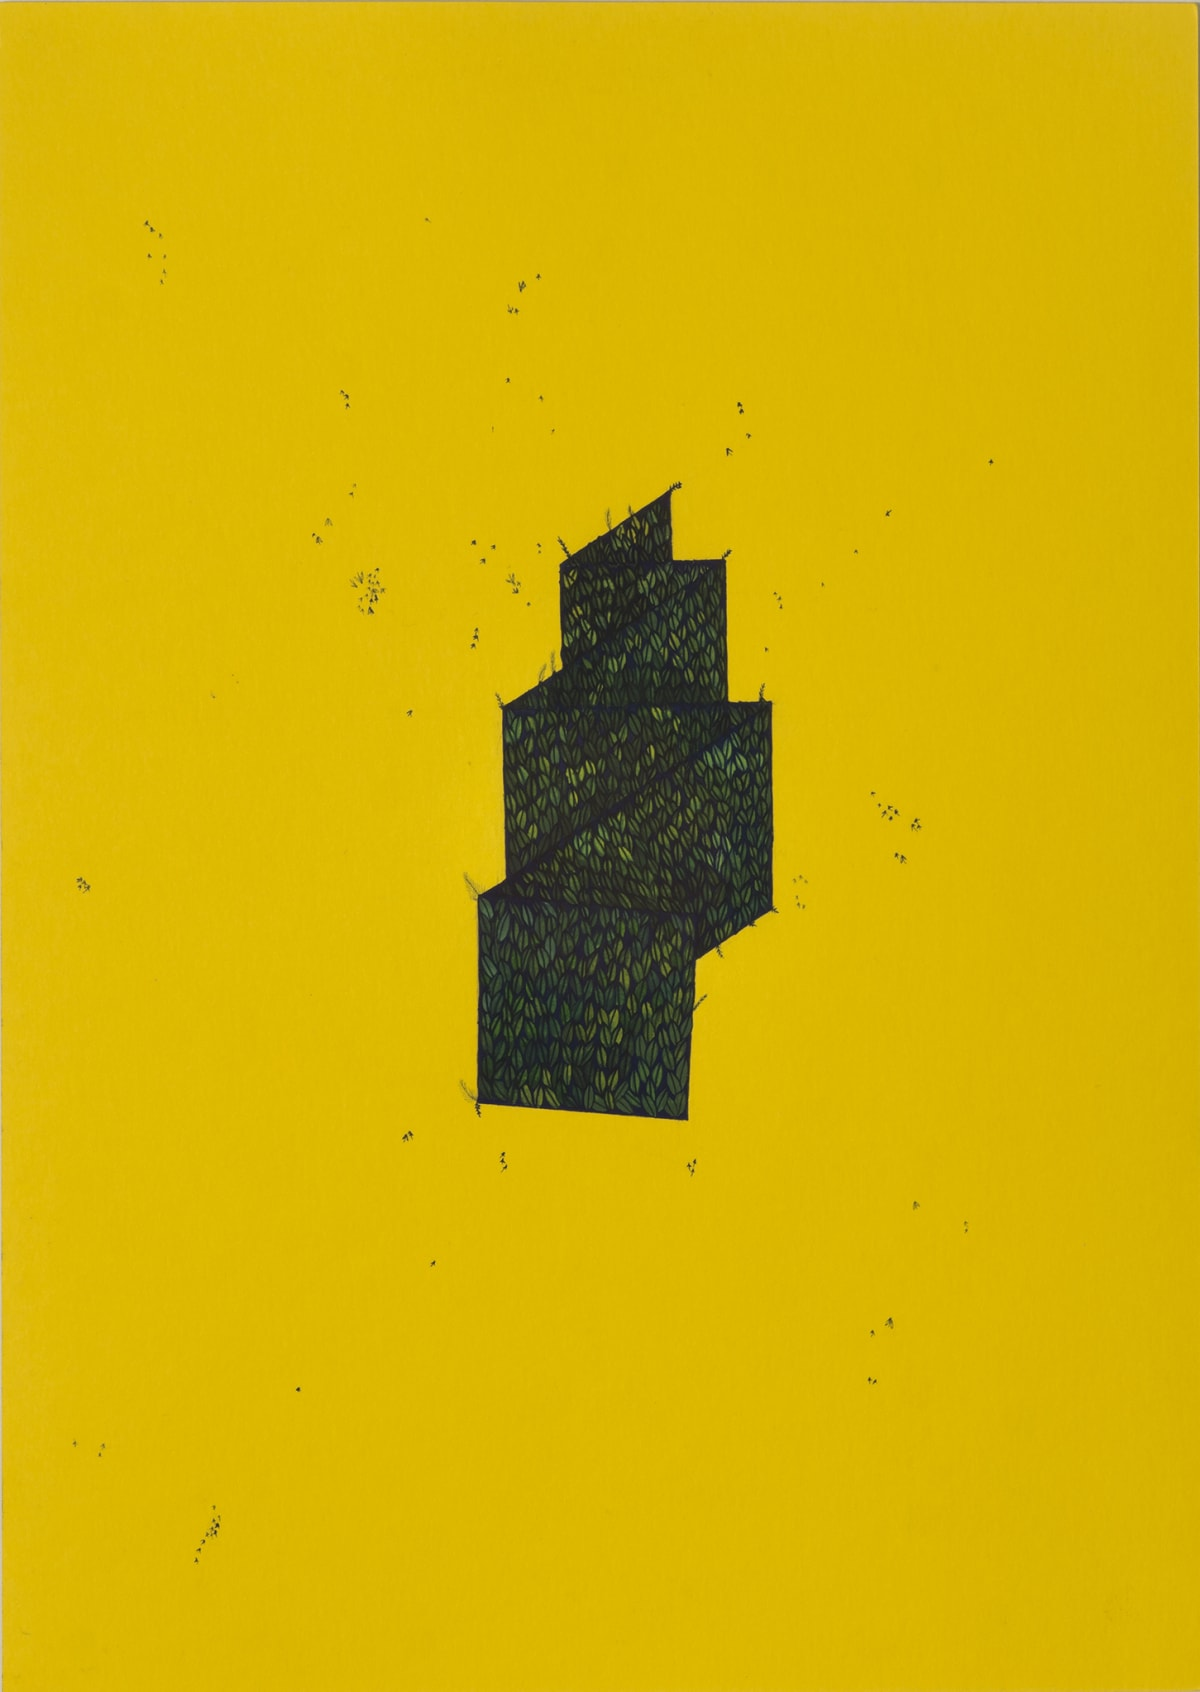 Wardha Shabbir b. 1987An Object in Space, 2019 Gouache on paper 29 x 25.6 cm 11 3/8 x 10 1/8 in